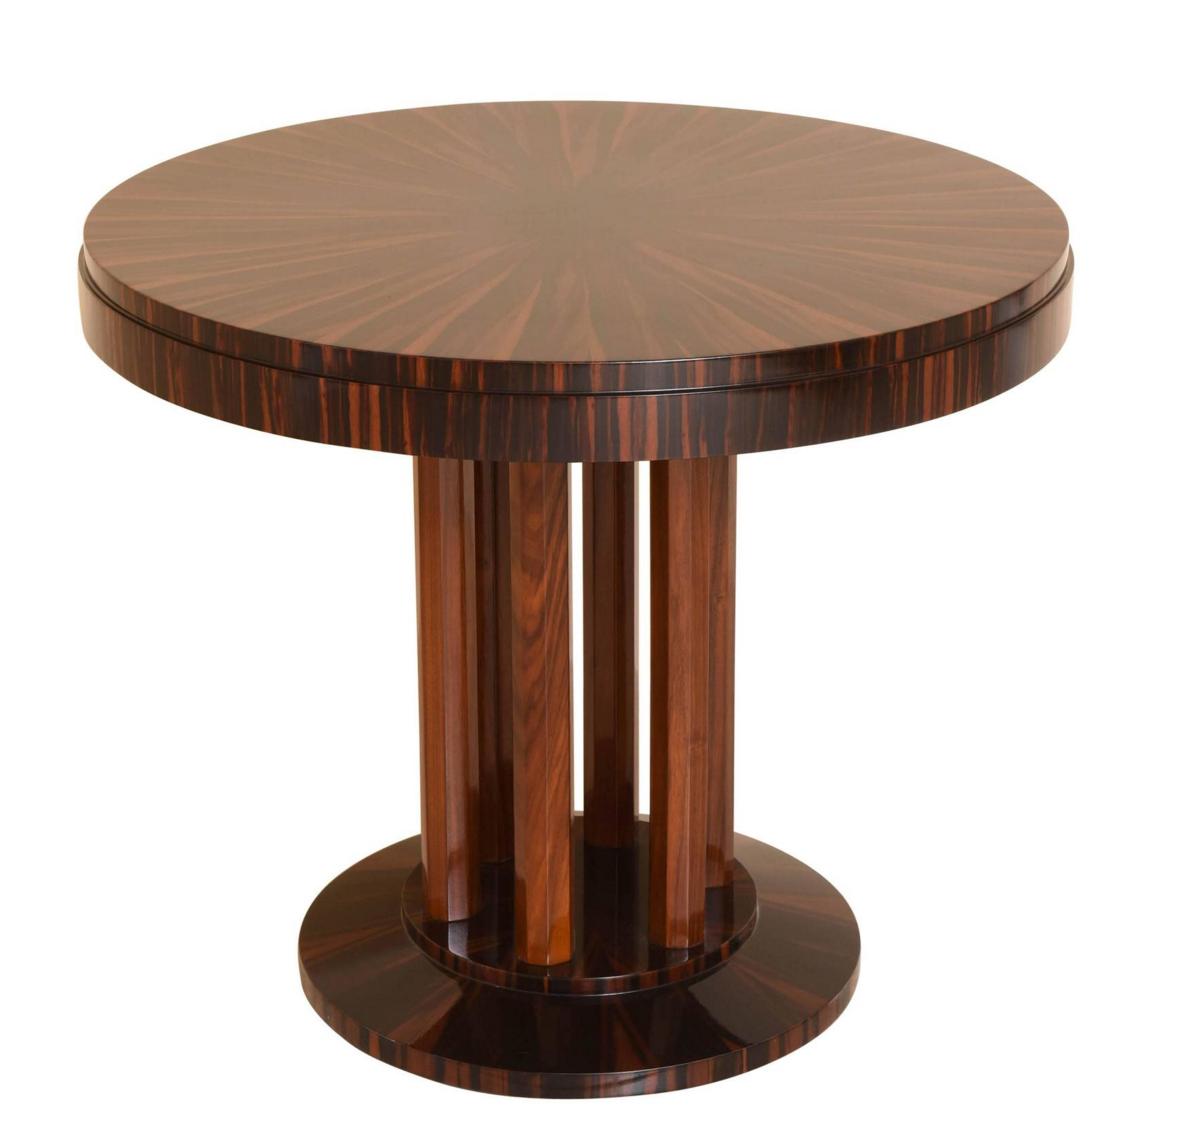 Maison rinck 1920s art deco coffee table in makassar ebony art deco coffee table geotapseo Images